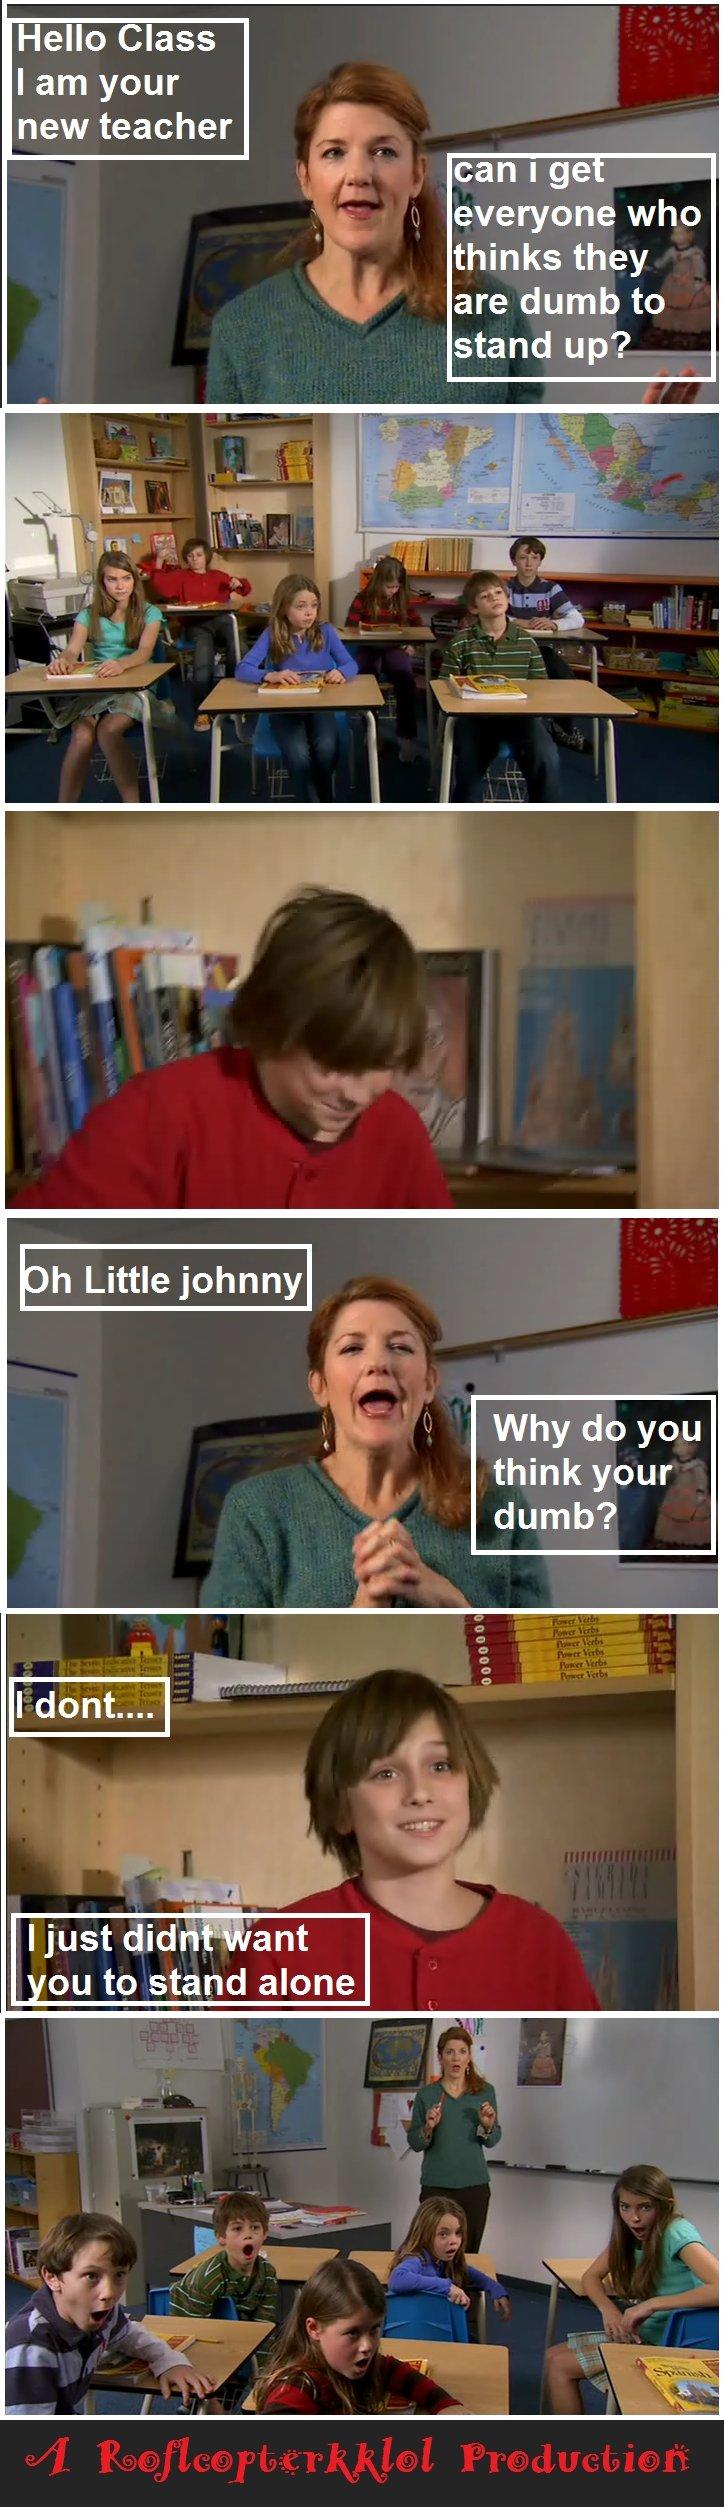 Little Johnny. Ahh johnny has a face /funny_pictures/2183952/Little+Johnny... /funny_pictures/2181414/Massive+Comp/ /funny_pictures/2182991/New+Reaction+... /fu little johnny joke